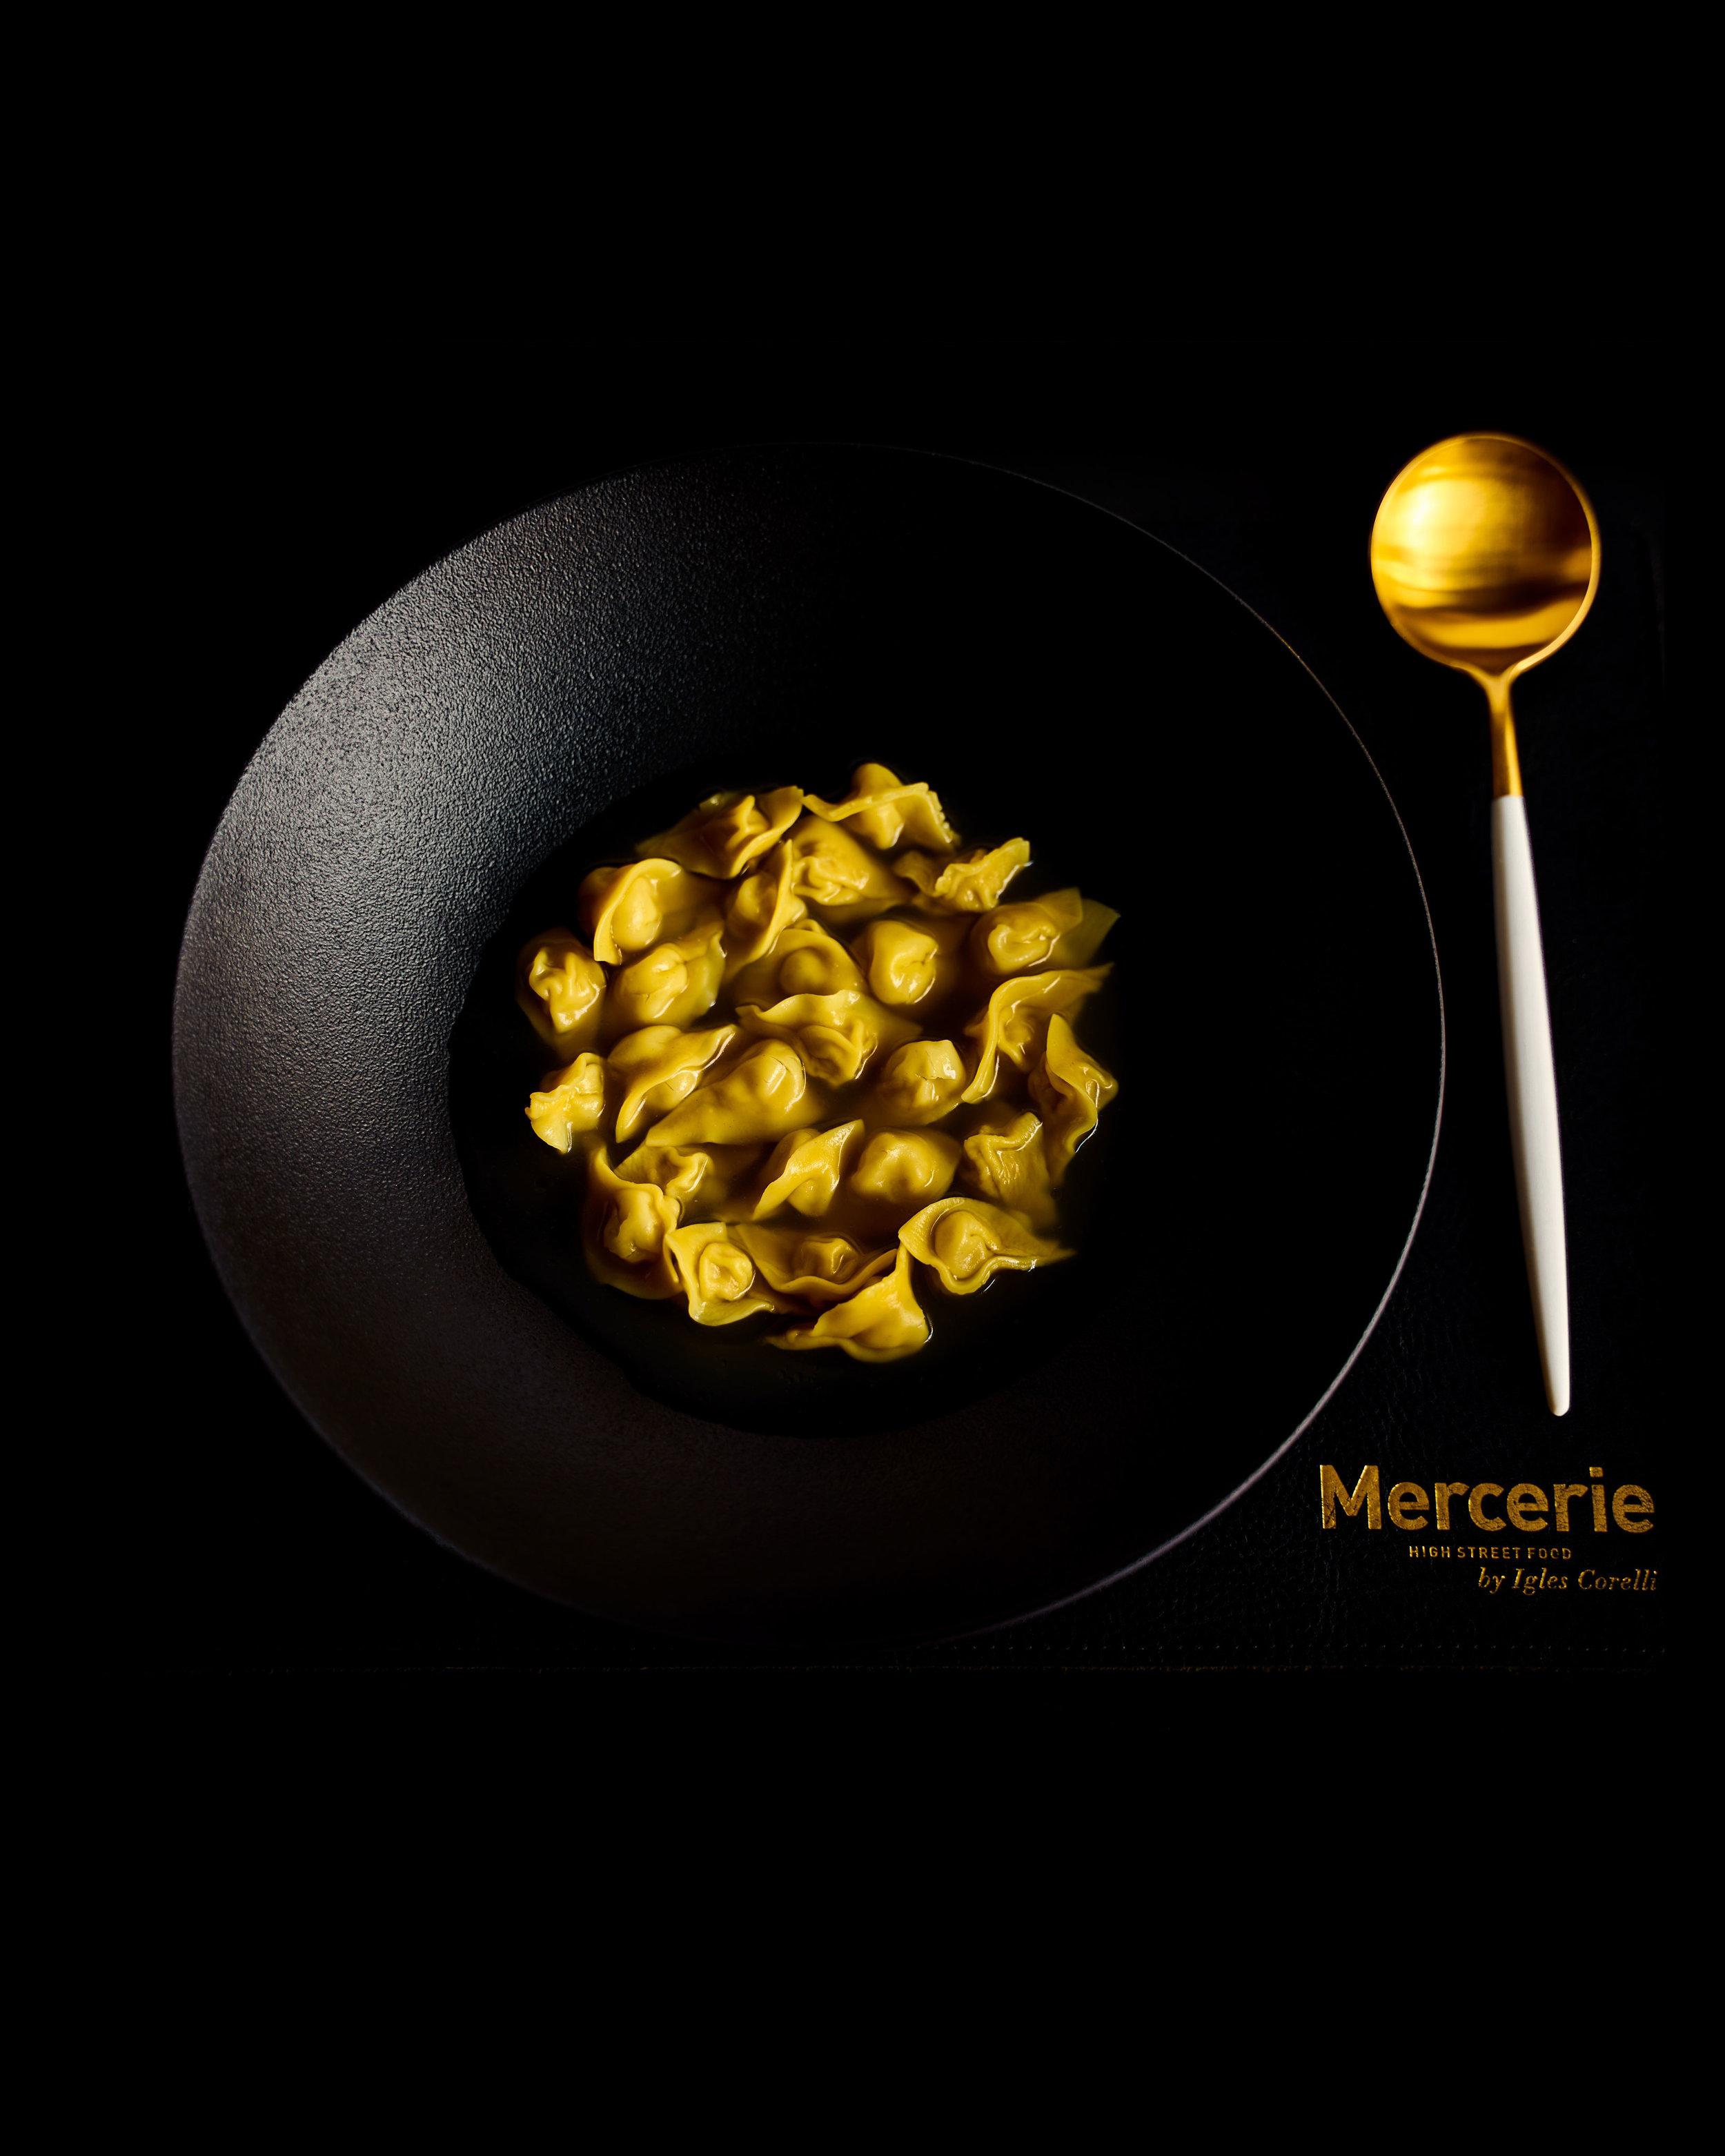 MERCERIE_0069_Dec-12-2018_LR_VERTICAL.jpg